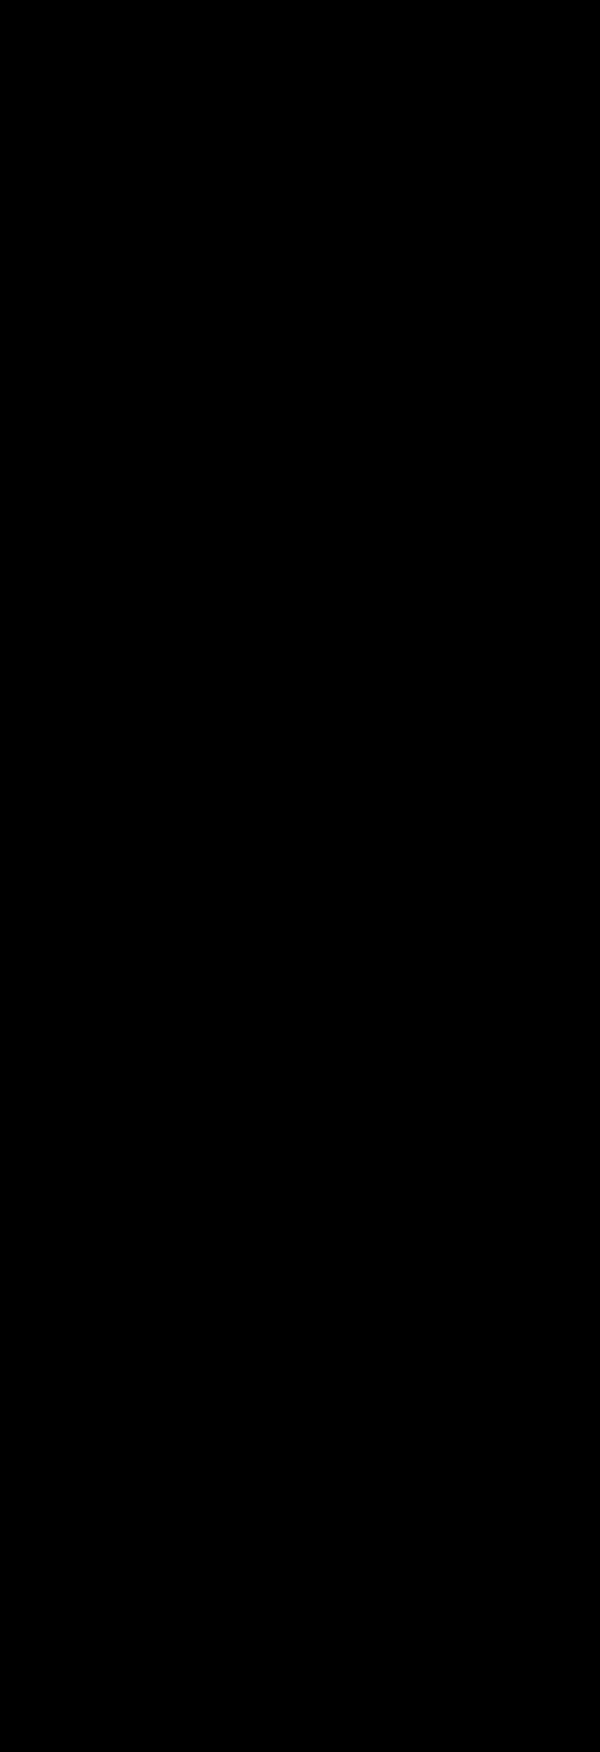 Man standing panda free. Worm clipart silhouette